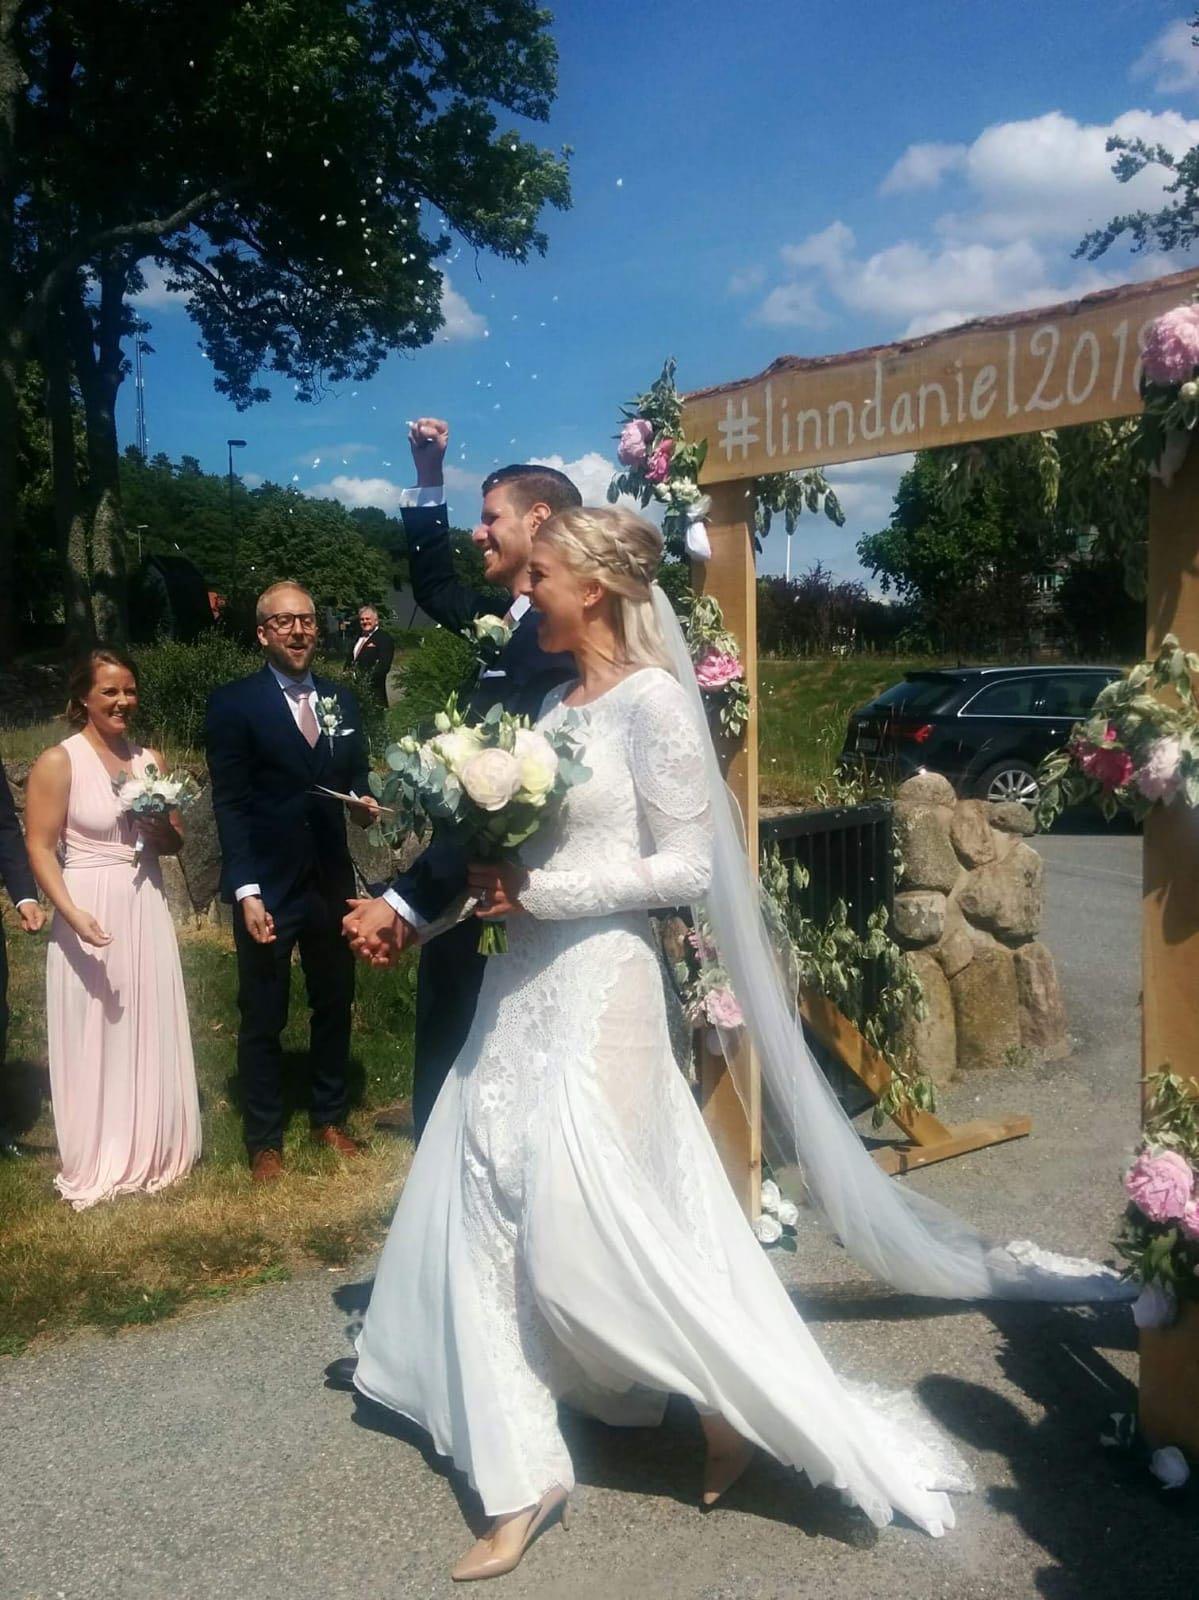 Linn Gustafsson wedding